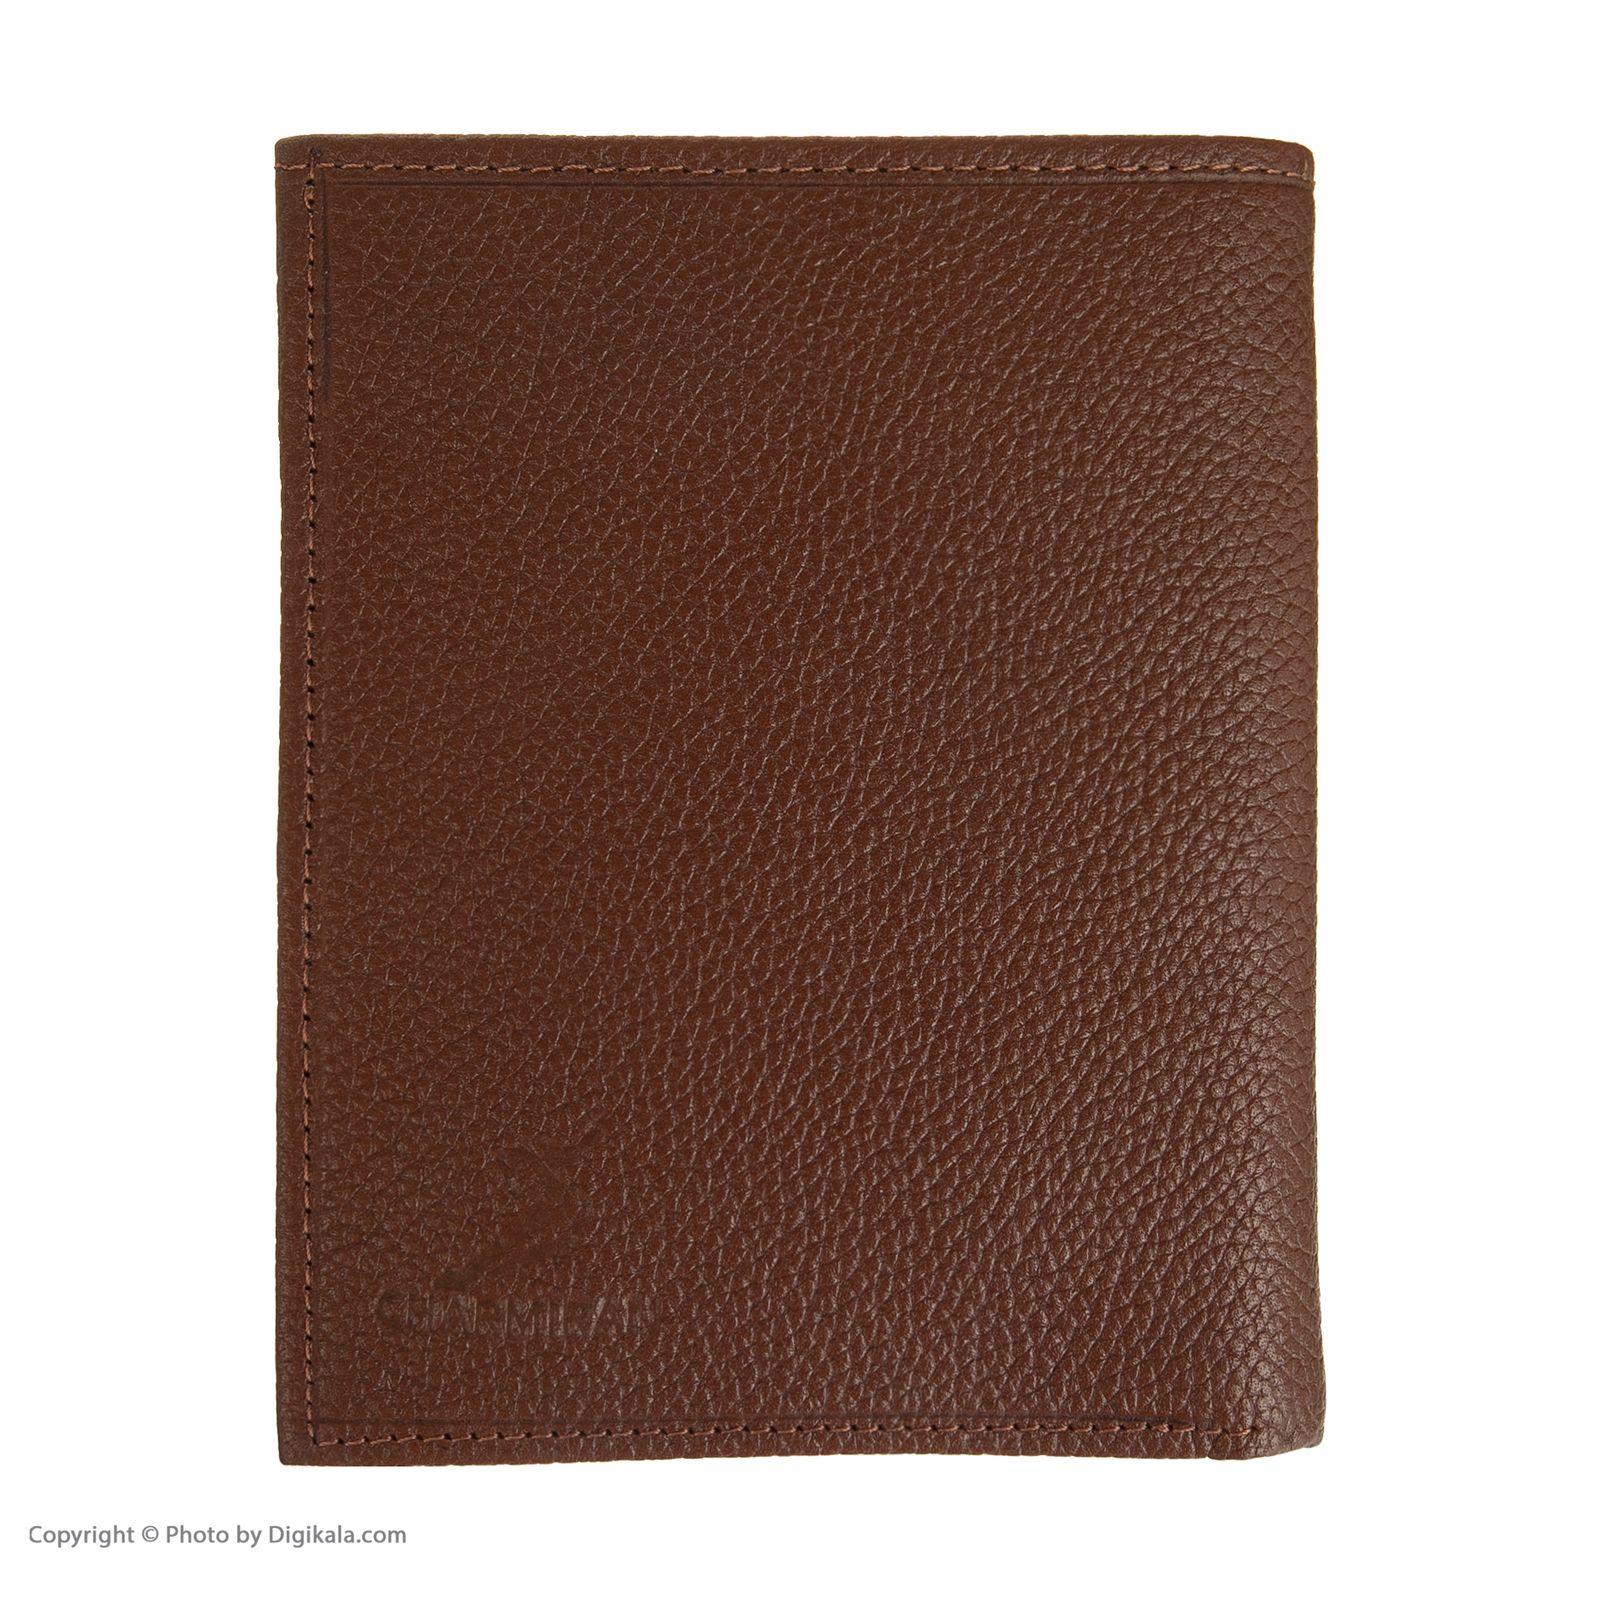 کیف پول مردانه چرمیران مدل 6057104 -  - 3